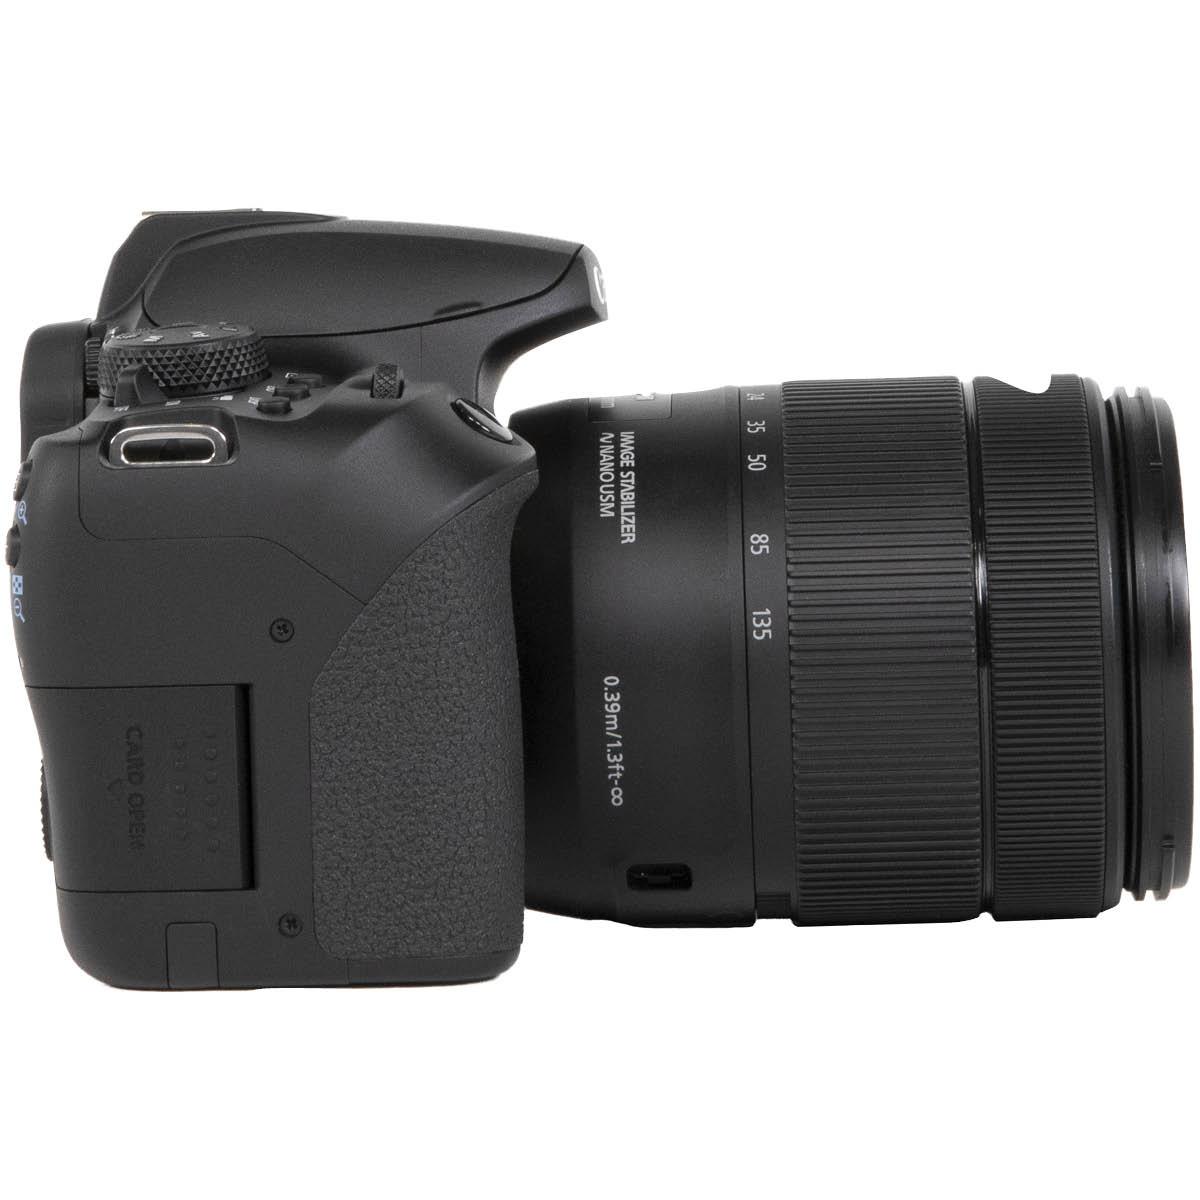 Canon EOS 850D Kit mit 18-135 mm 1:3,5-5,6